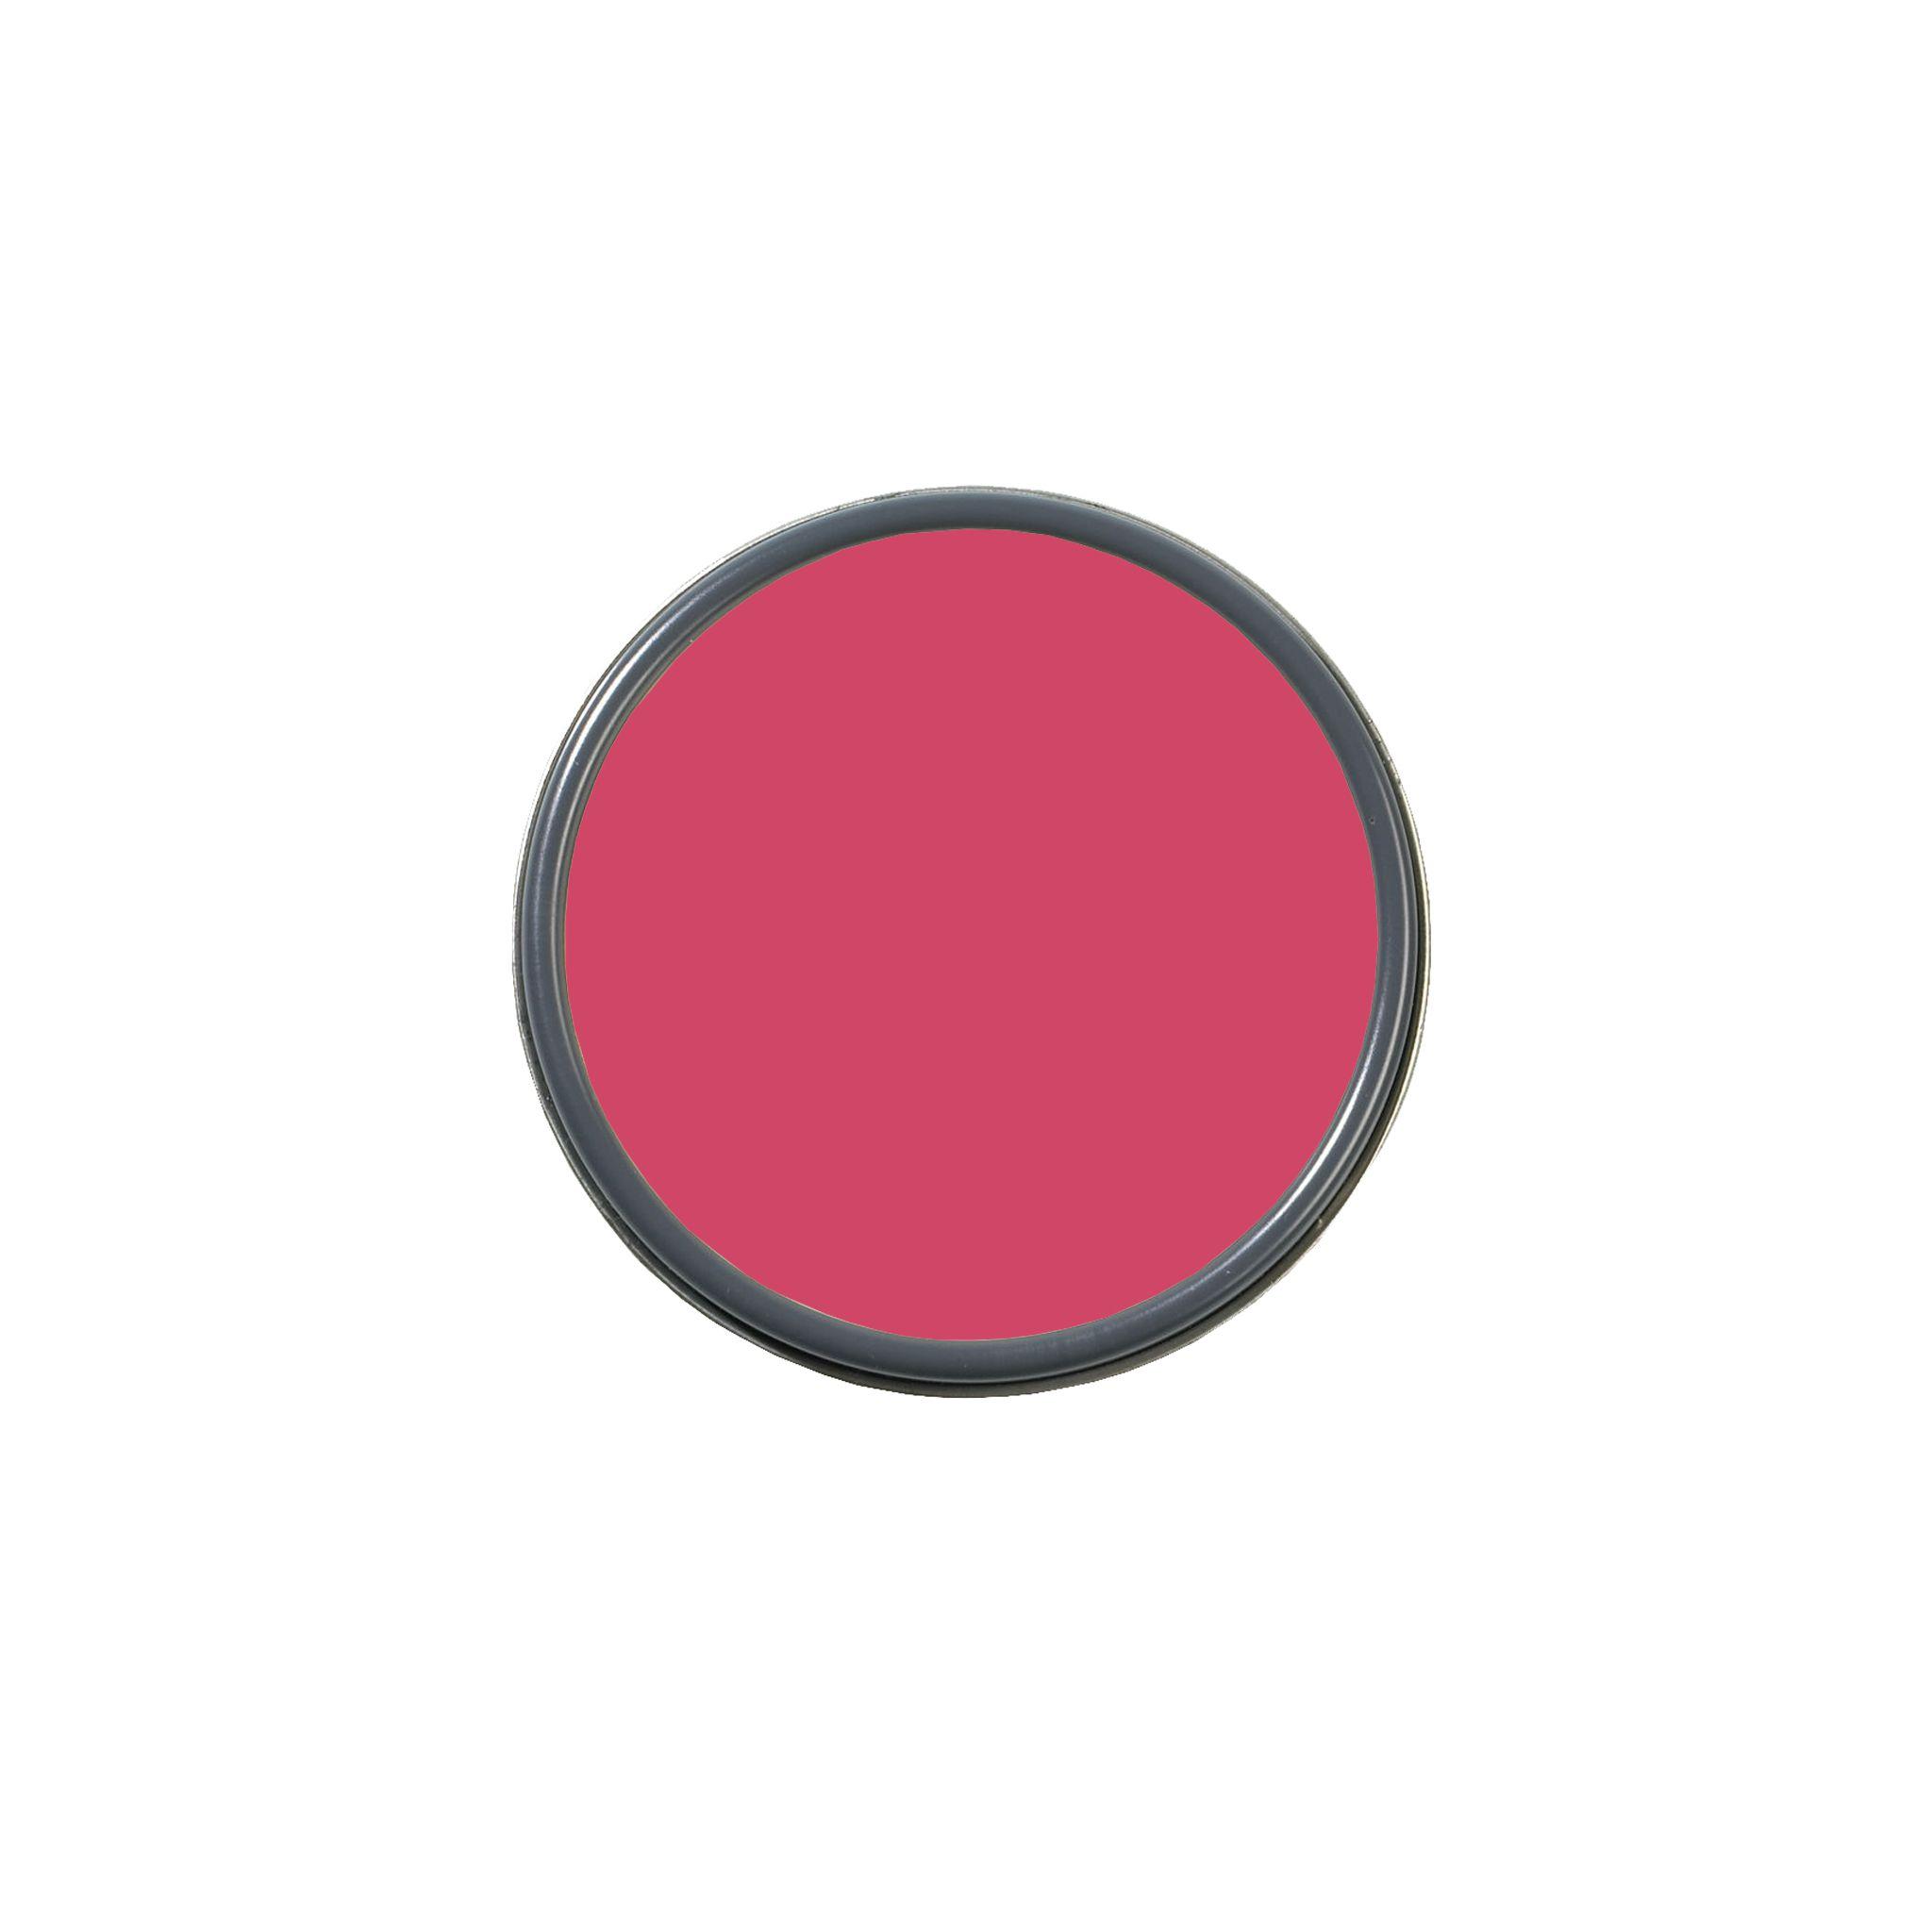 Rosy Blush paint